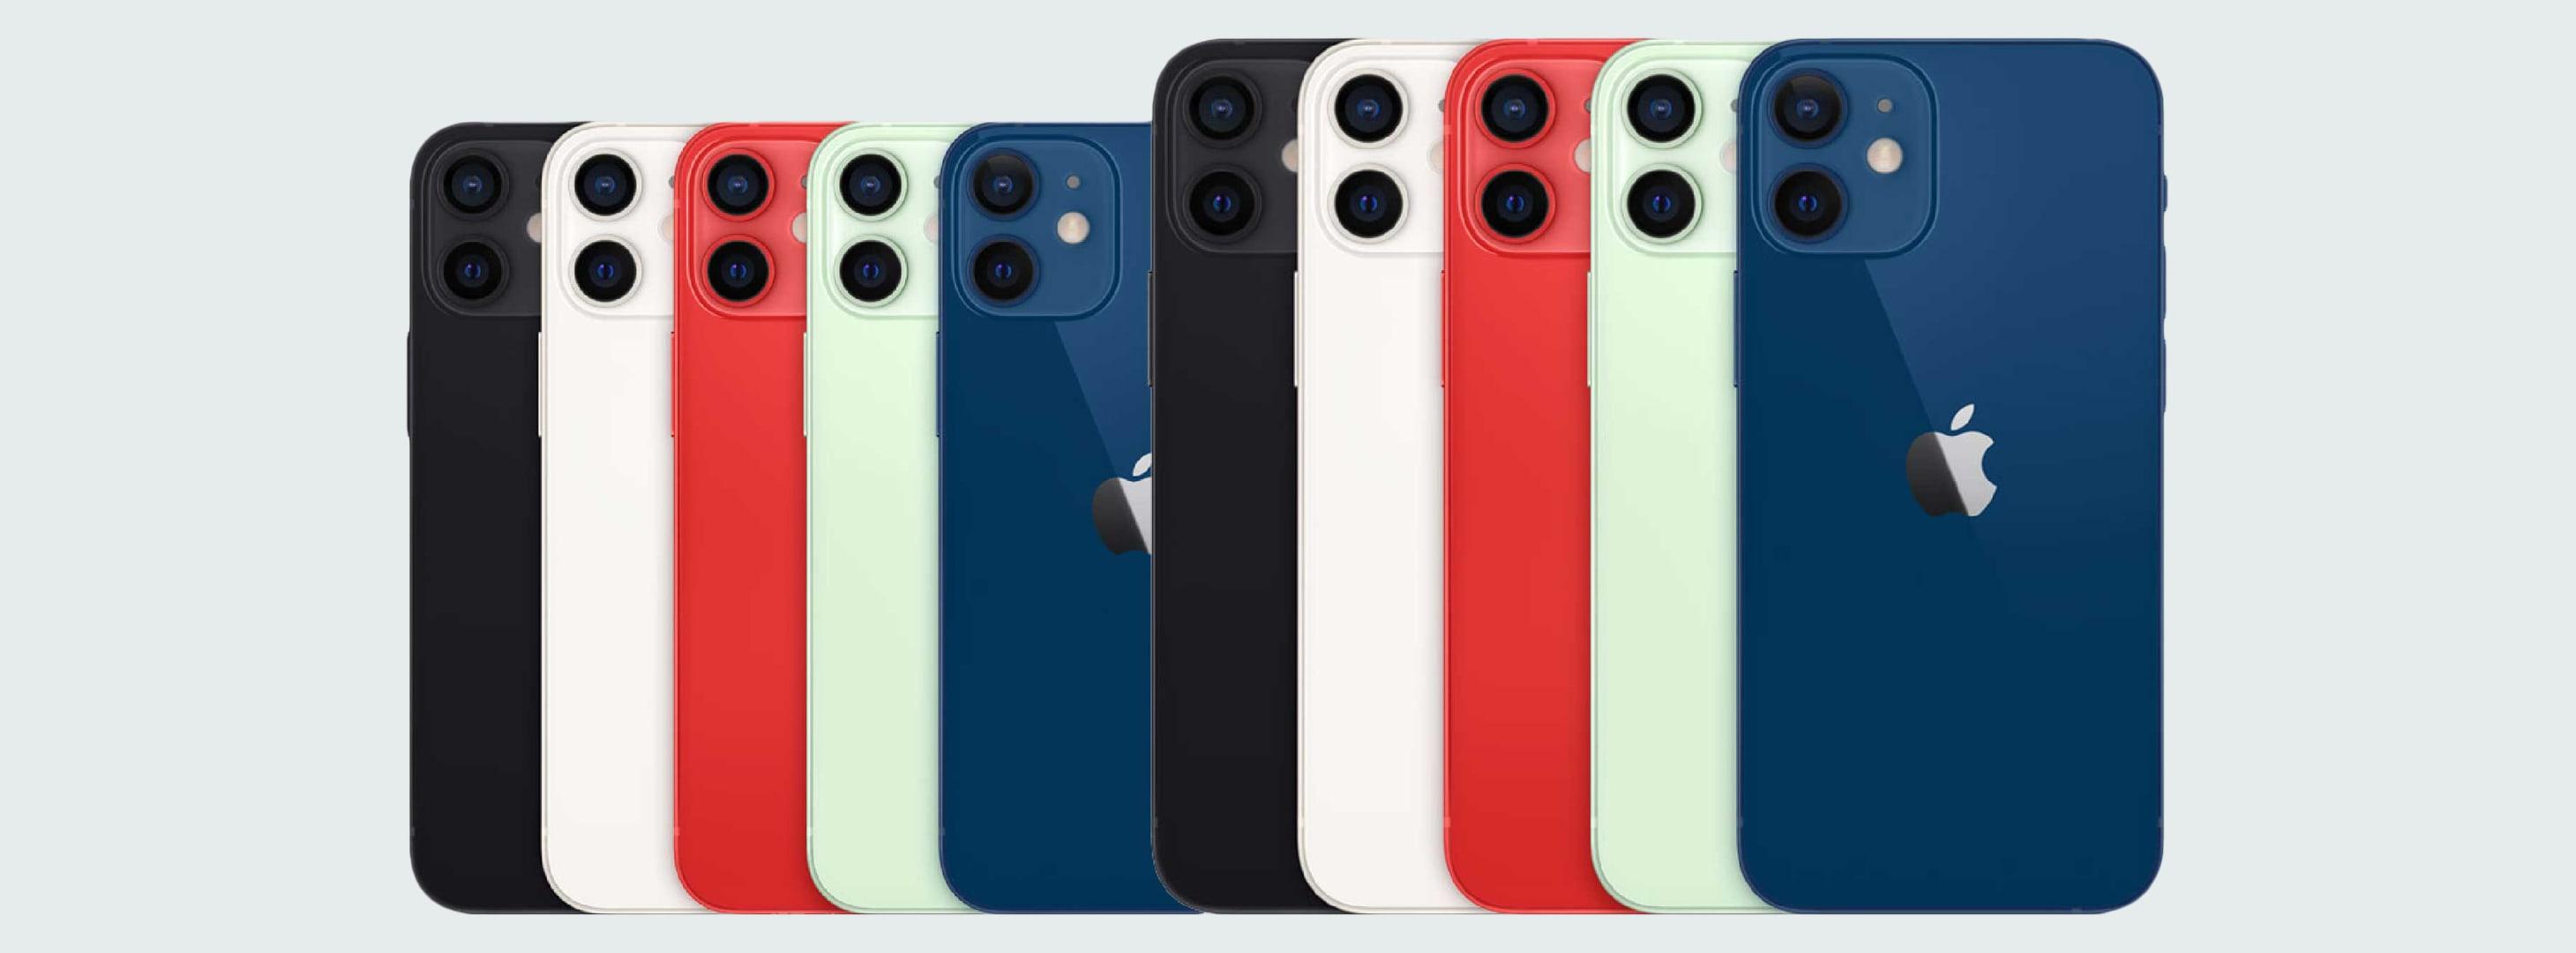 allapplenews-iphone-12-and-12-mini-colors-back